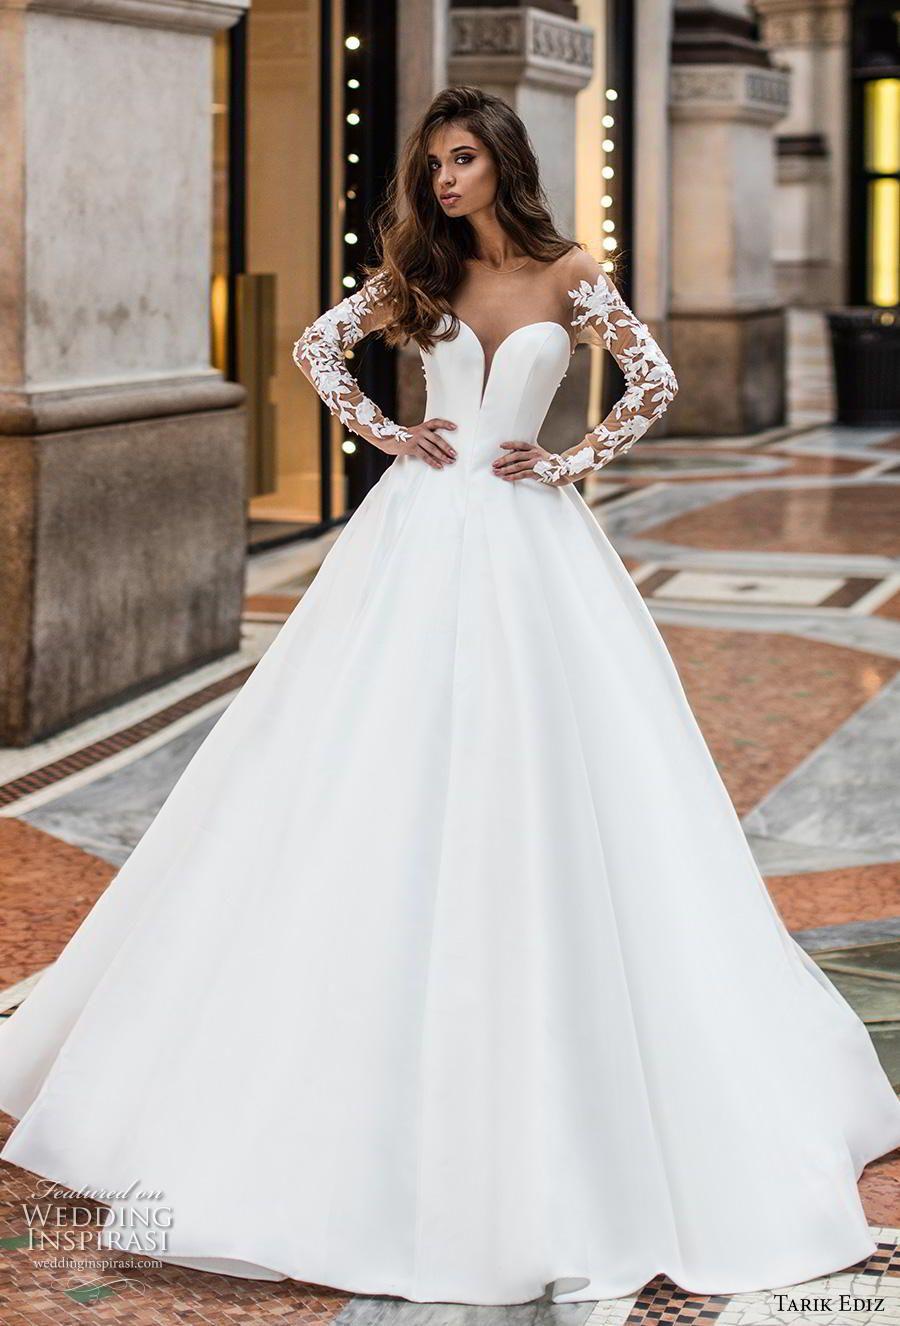 Tarik Ediz 2019 Wedding Dresses White Bridal Collection Wedding Inspirasi Wedding Dress Long Sleeve Wedding Dresses Ball Gown Wedding Dress [ 1326 x 900 Pixel ]